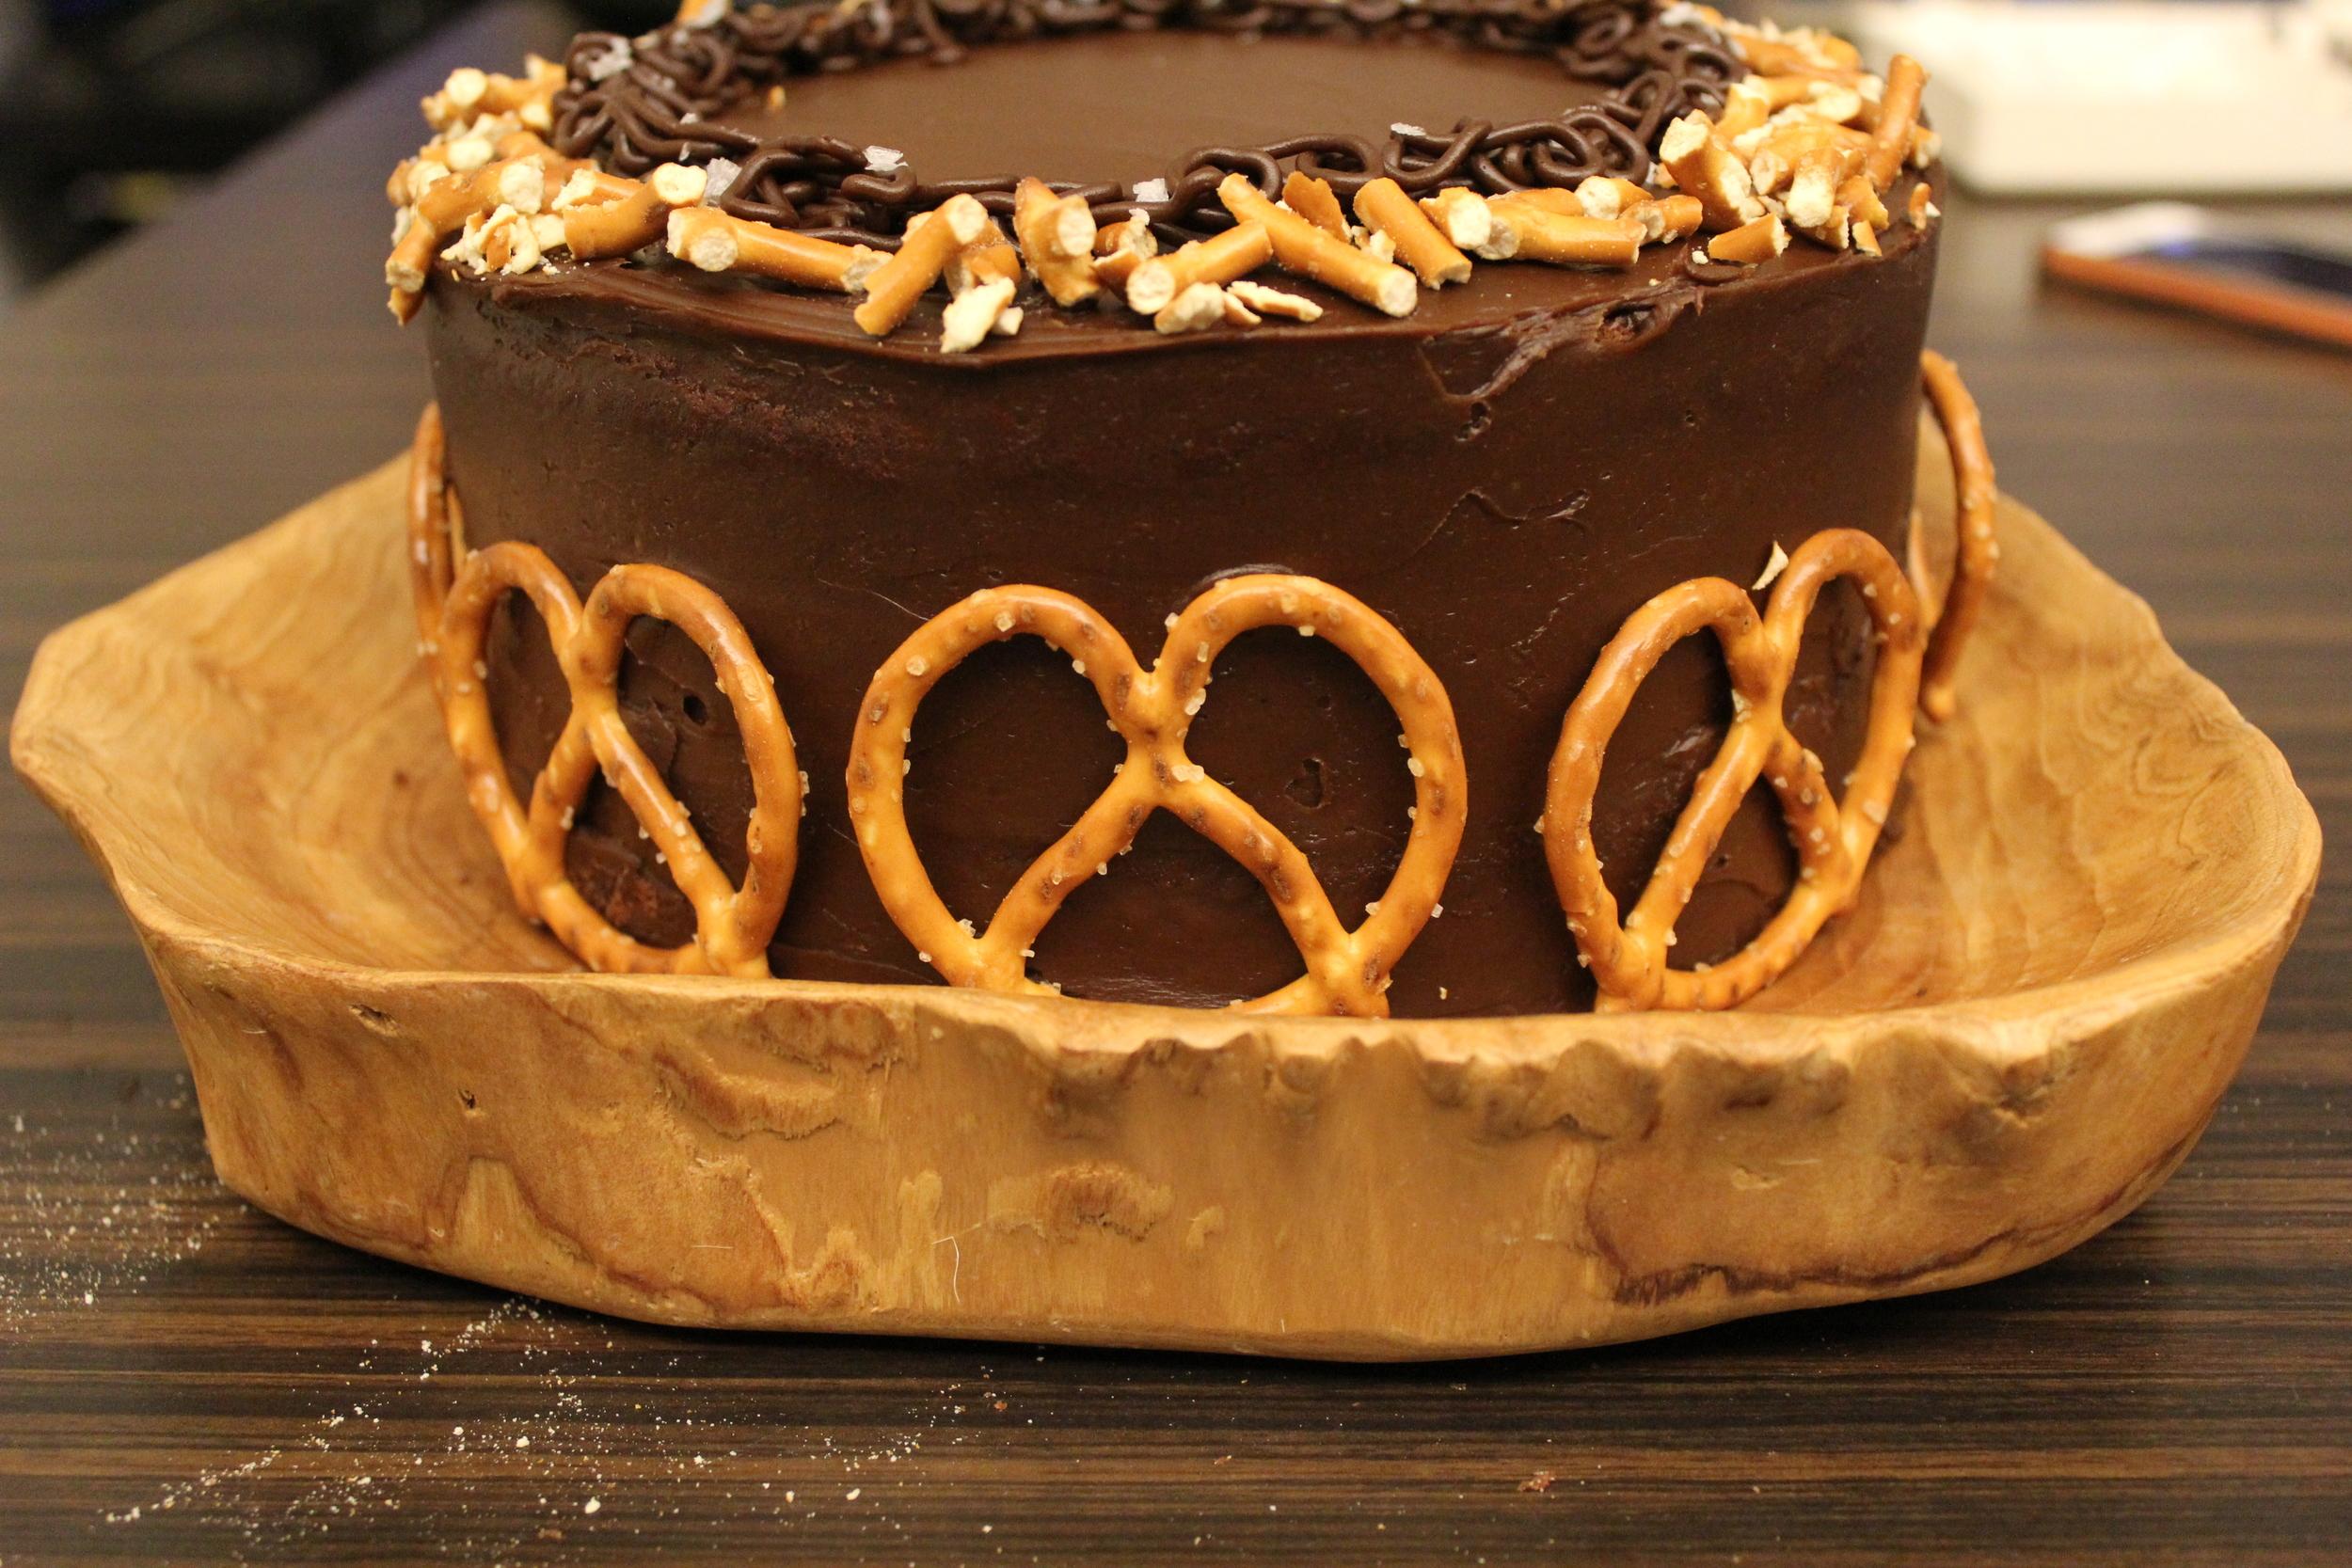 salted caramel and dark chocolate + pretzel cake